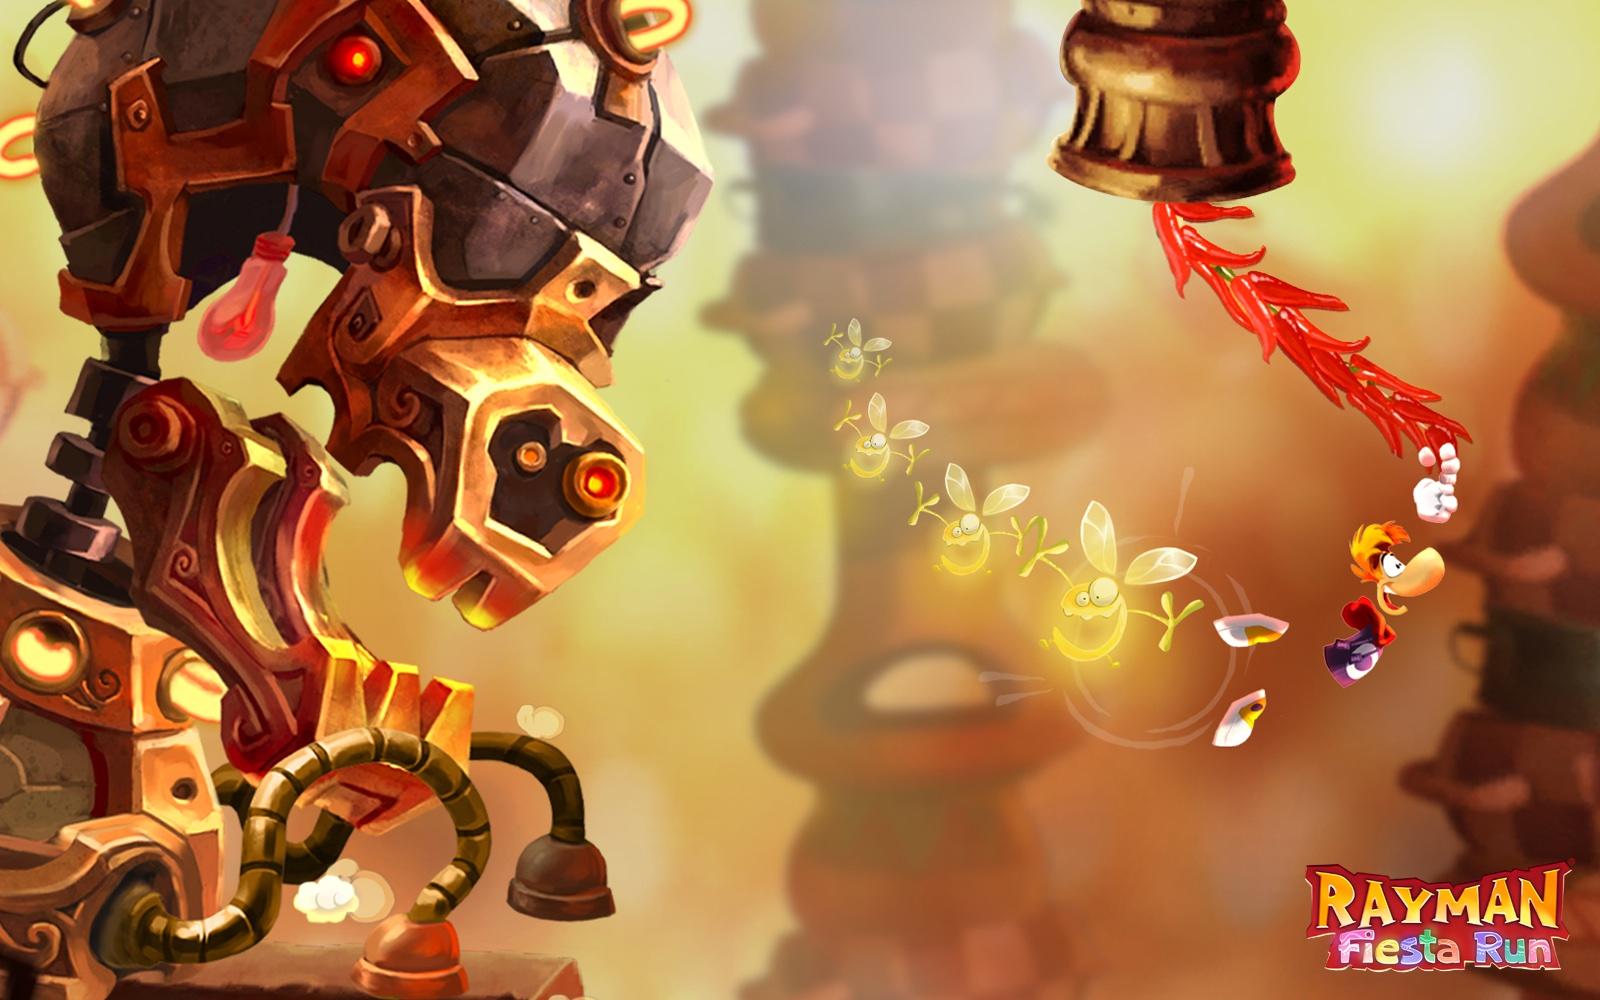 Jogo Rayman Fiesta Run para iOS